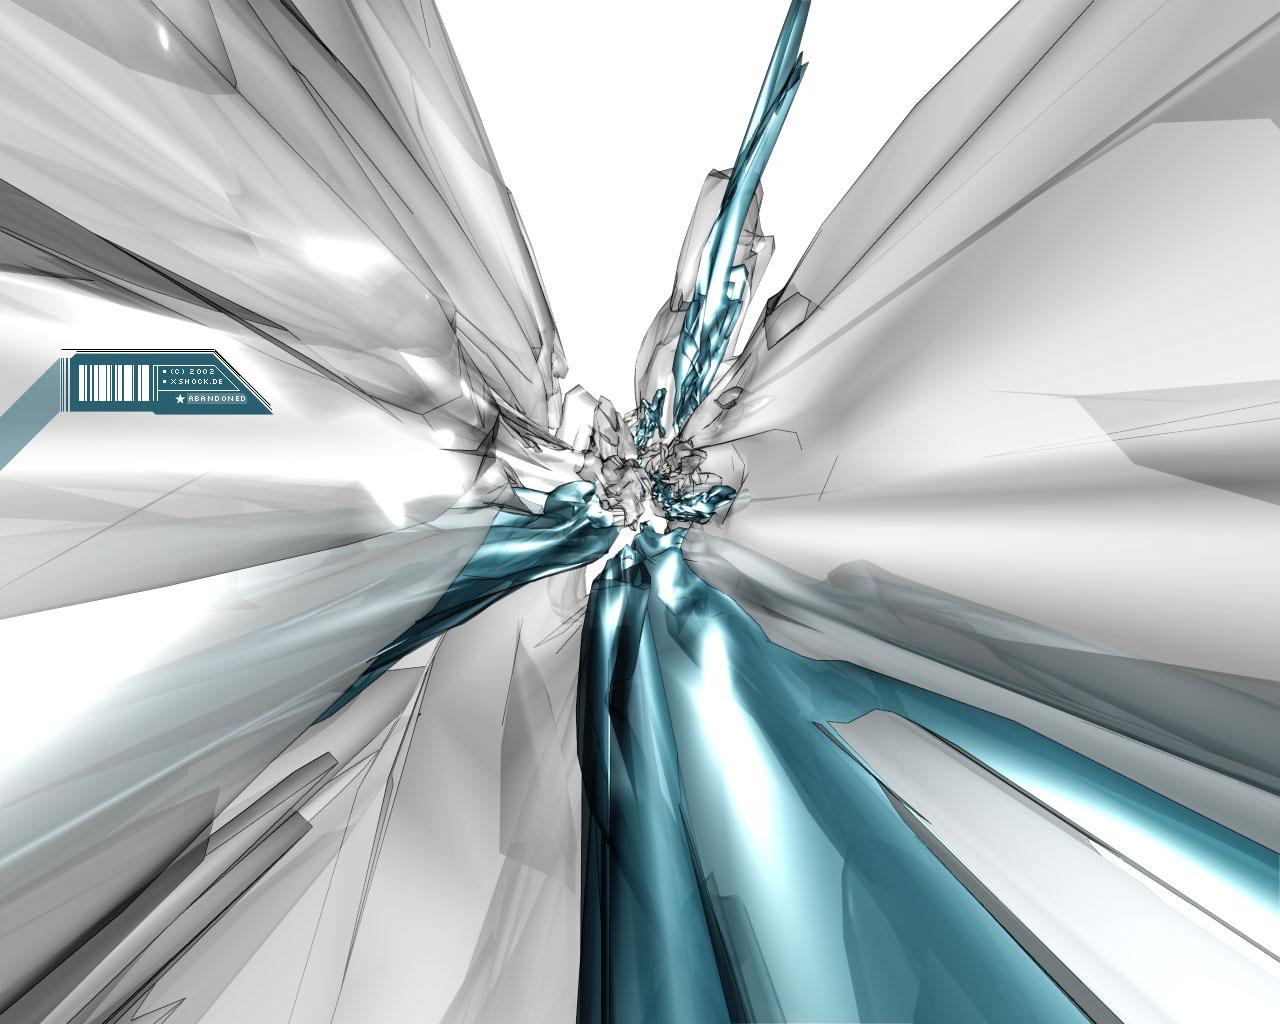 http://1.bp.blogspot.com/-S_JK-lRSwA4/UT3LLJIpNII/AAAAAAAAALM/A3GvDLUTvCE/s1600/3D-Wallpapers65.jpg